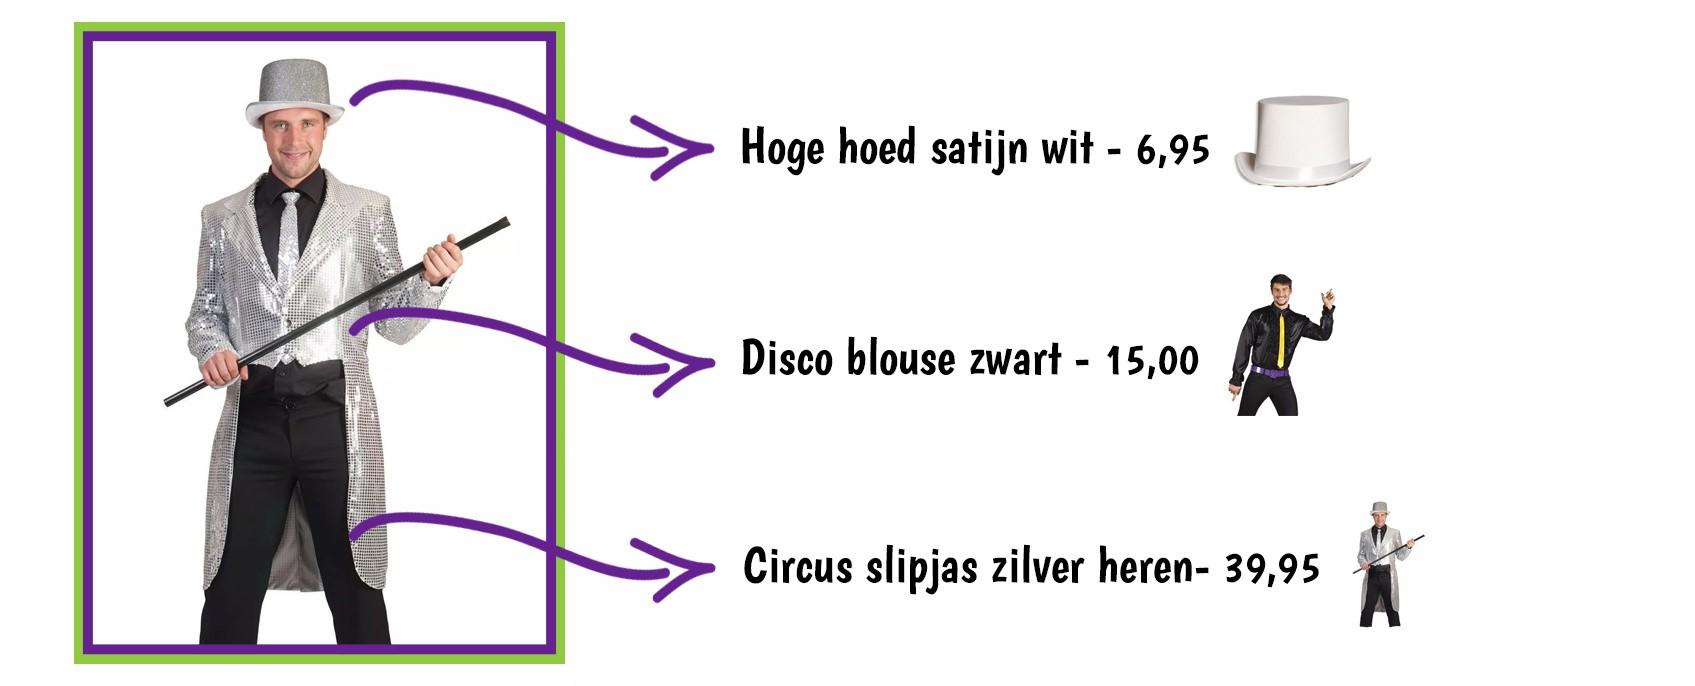 3606303806-CoenSander_circusdirecteur2.jpg